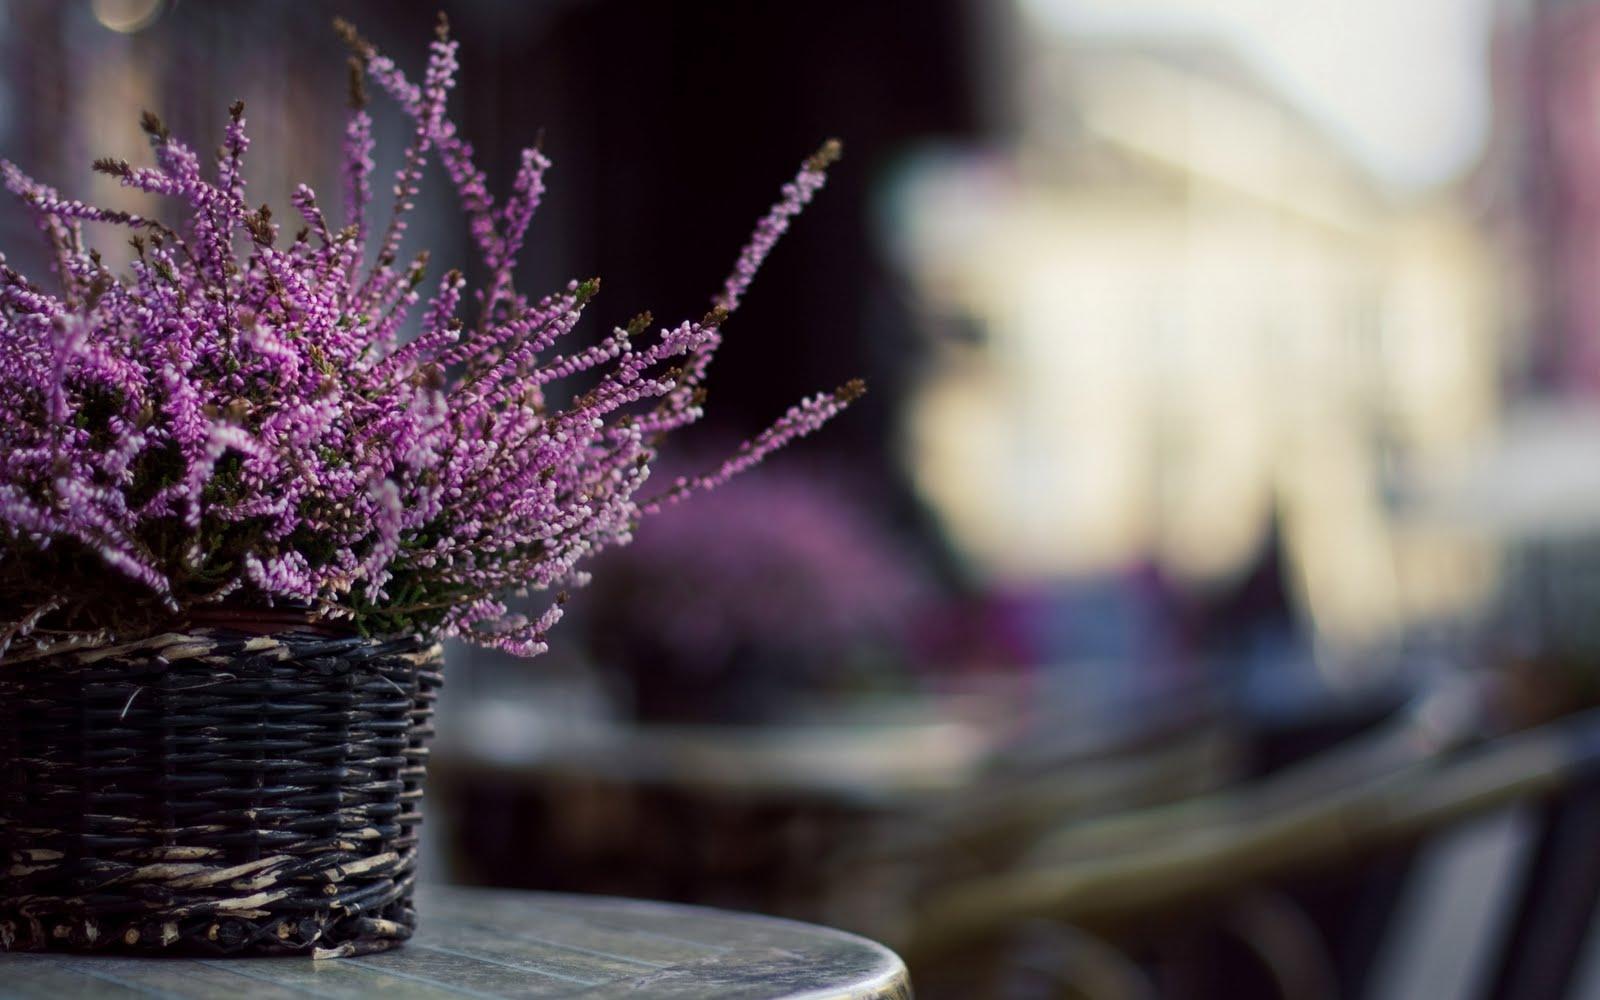 table flowers desktop backgrounds